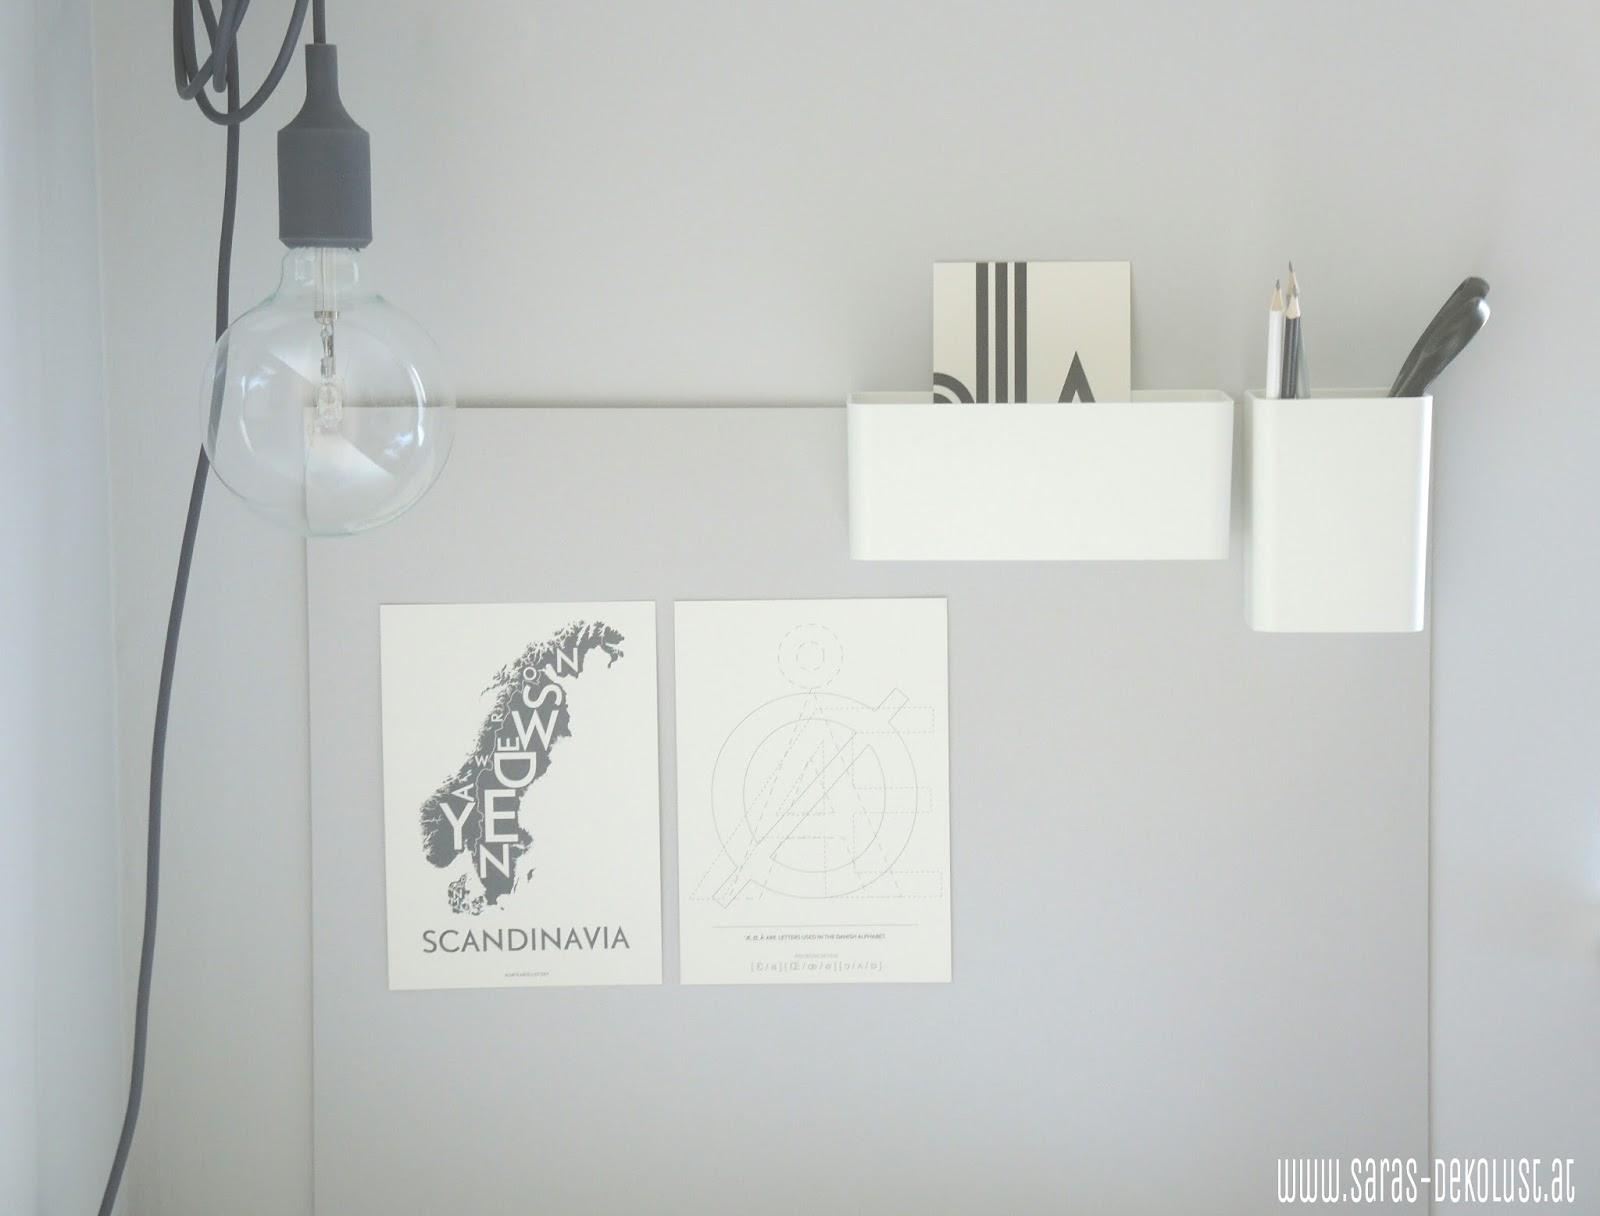 saras dekolust diy pinnwand im arbeitszimmer. Black Bedroom Furniture Sets. Home Design Ideas